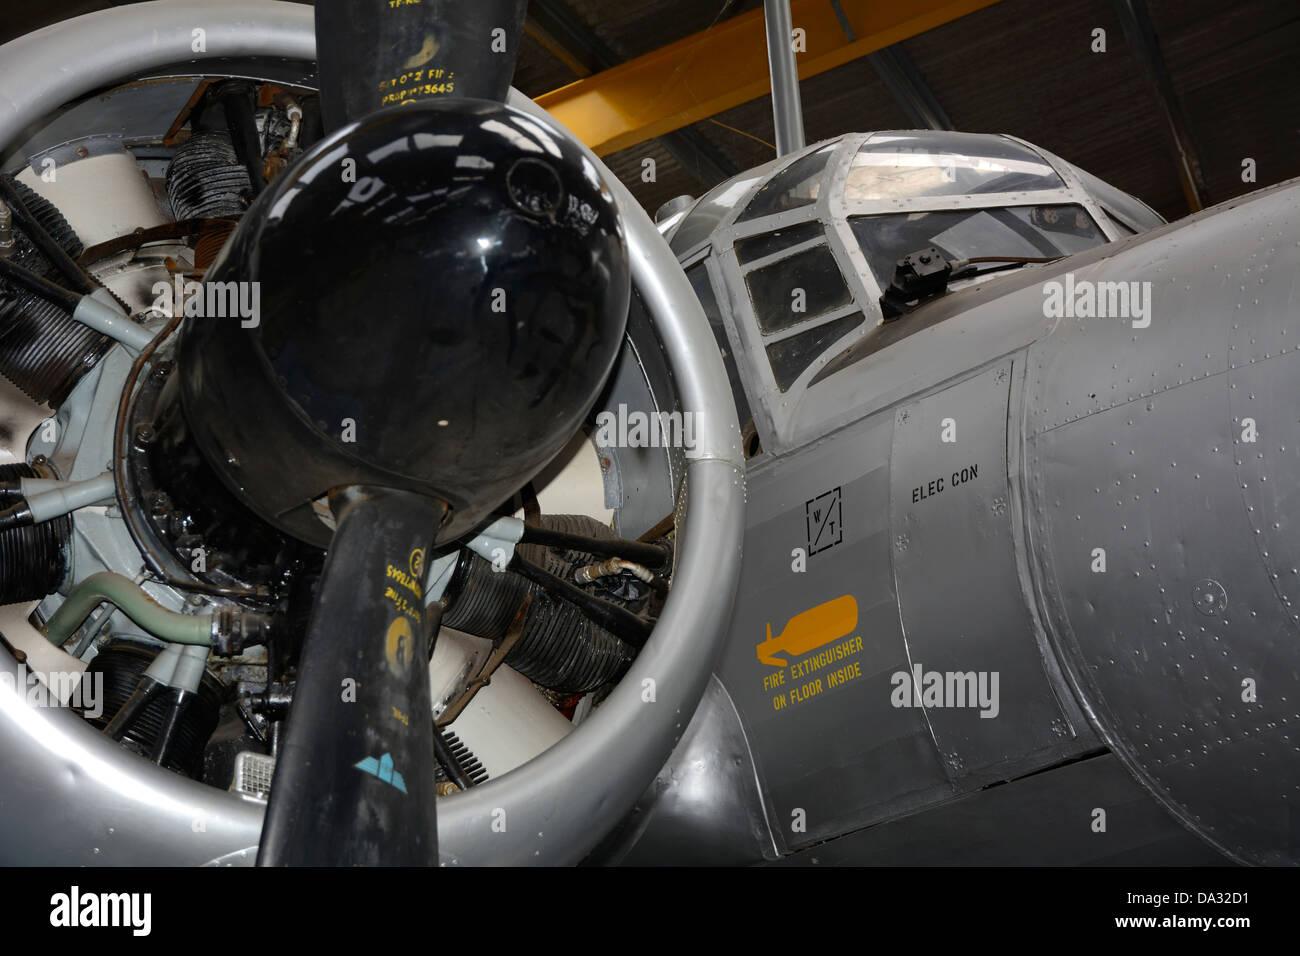 POST WAR RAF AVRO ANSON PISTON POWERED MULTI-PURPOSE AIRCRAFT. - Stock Image